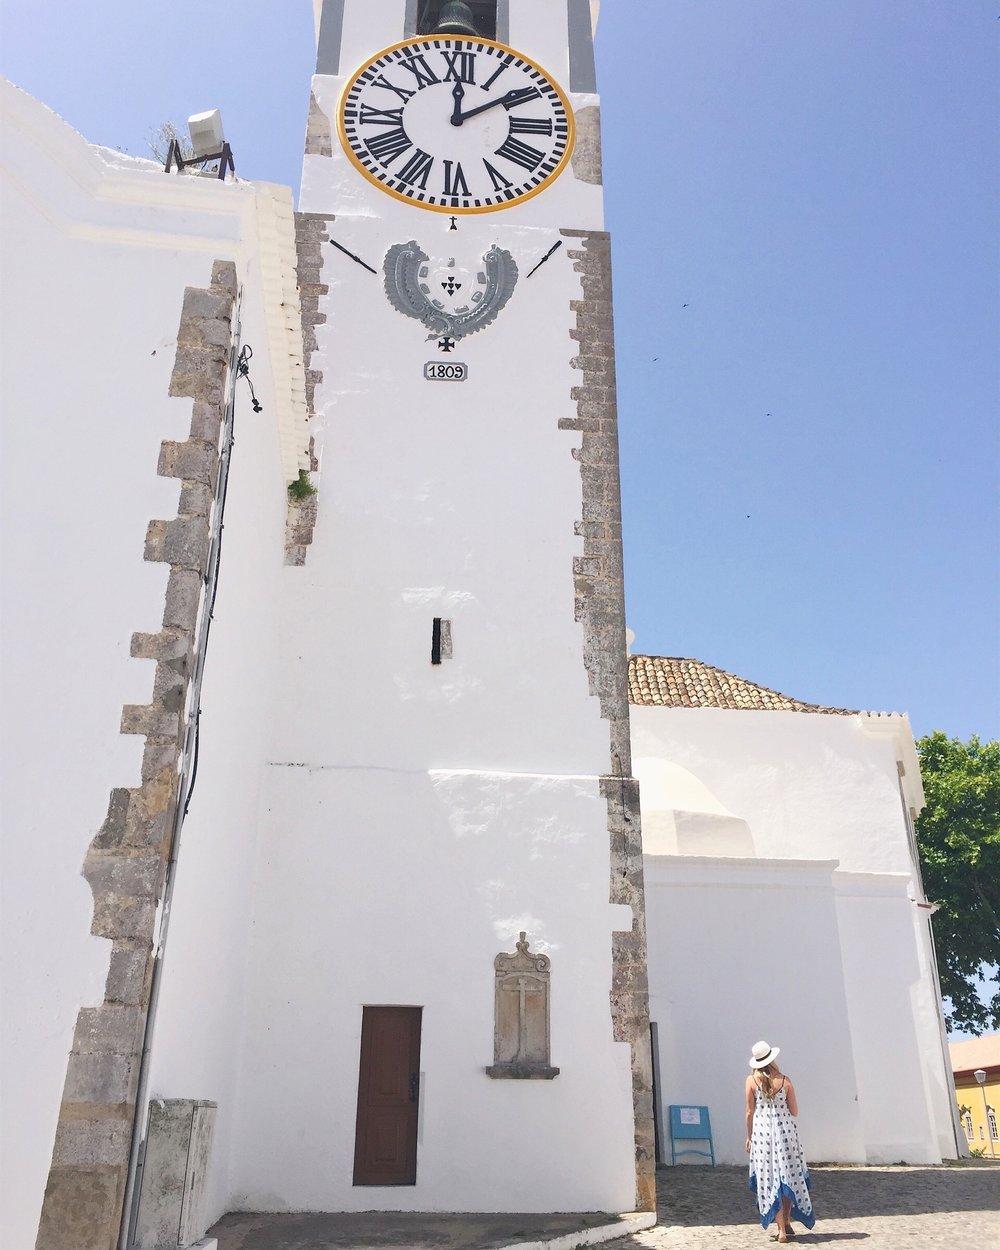 Exploring the streets of Tavira, Portugal